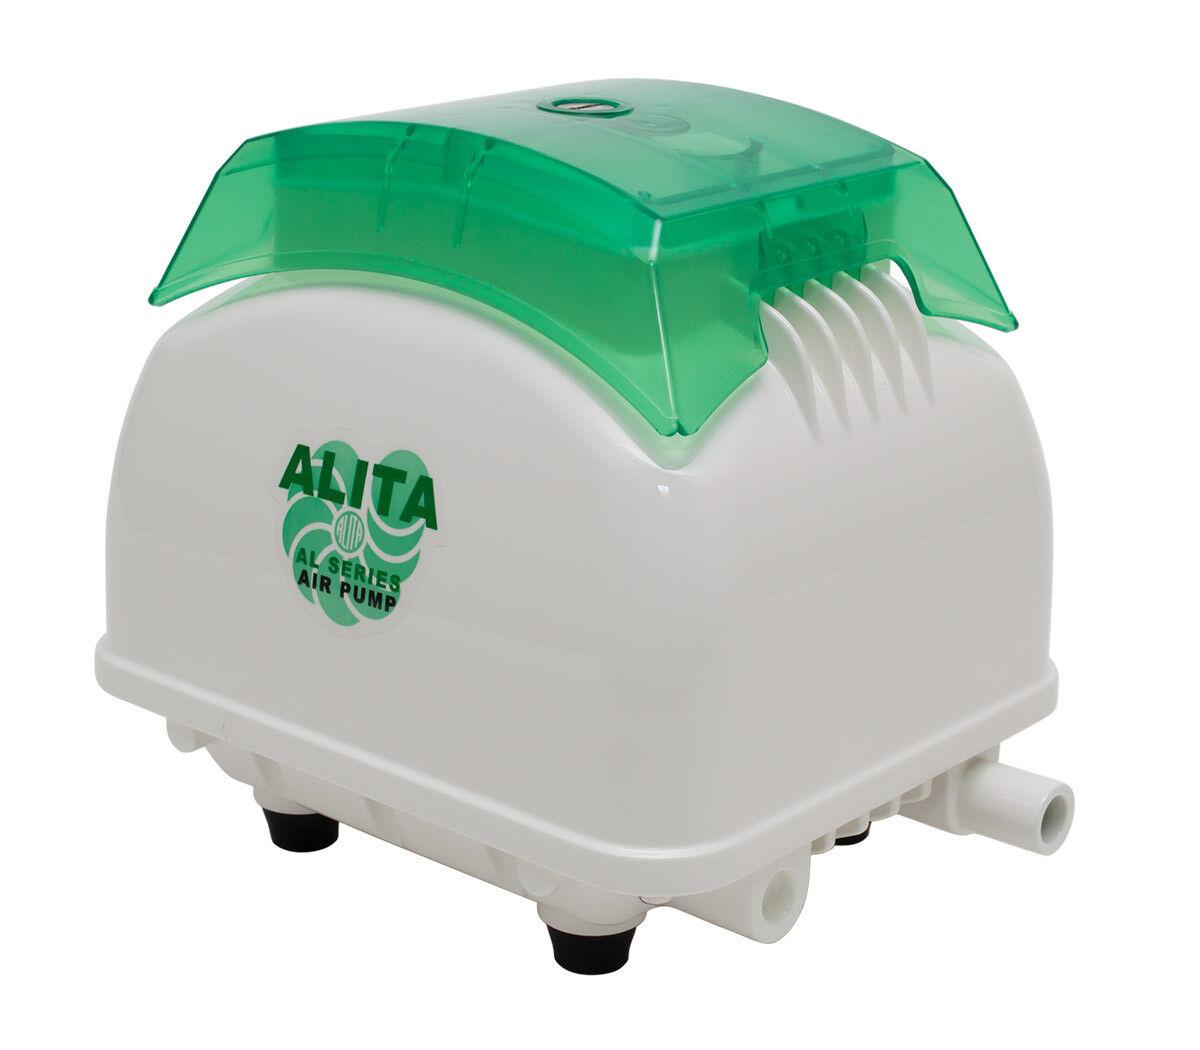 ALITA AL-40 60 80 Air Pump,Aquariums,Koi Pond, Hydroponics &more,3 YEAR WARRANTY